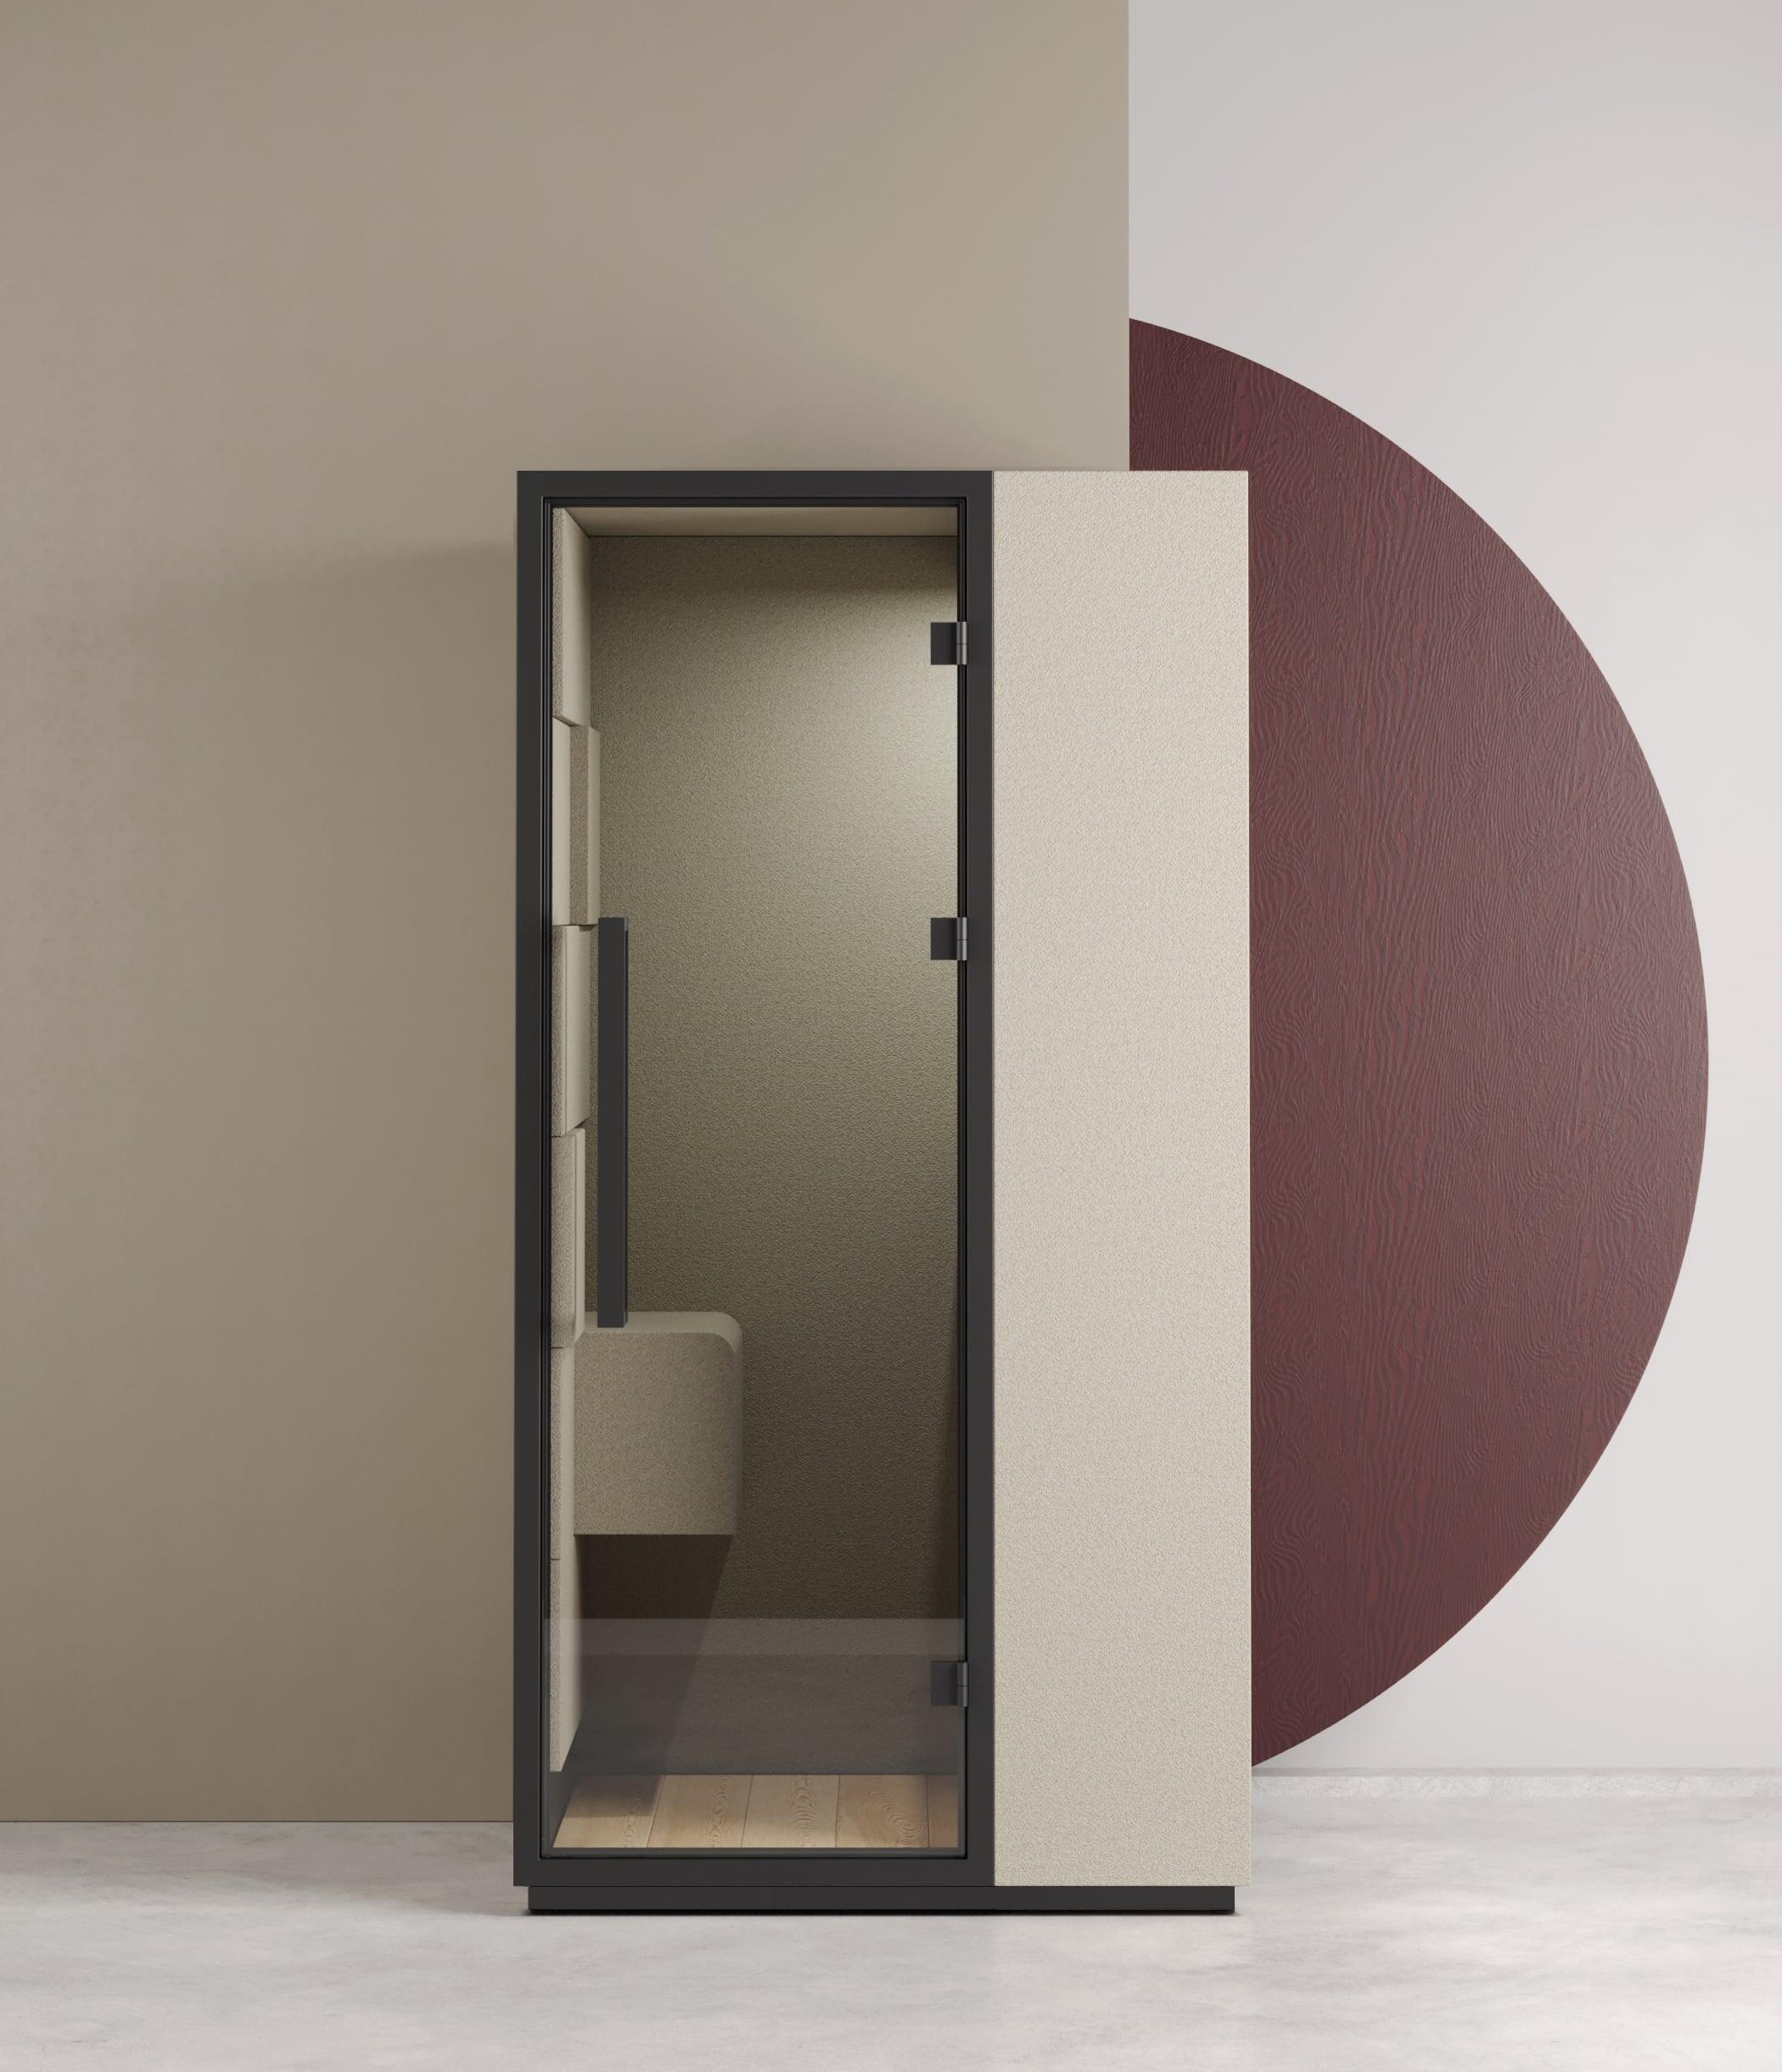 quadra-standing-box-render-1